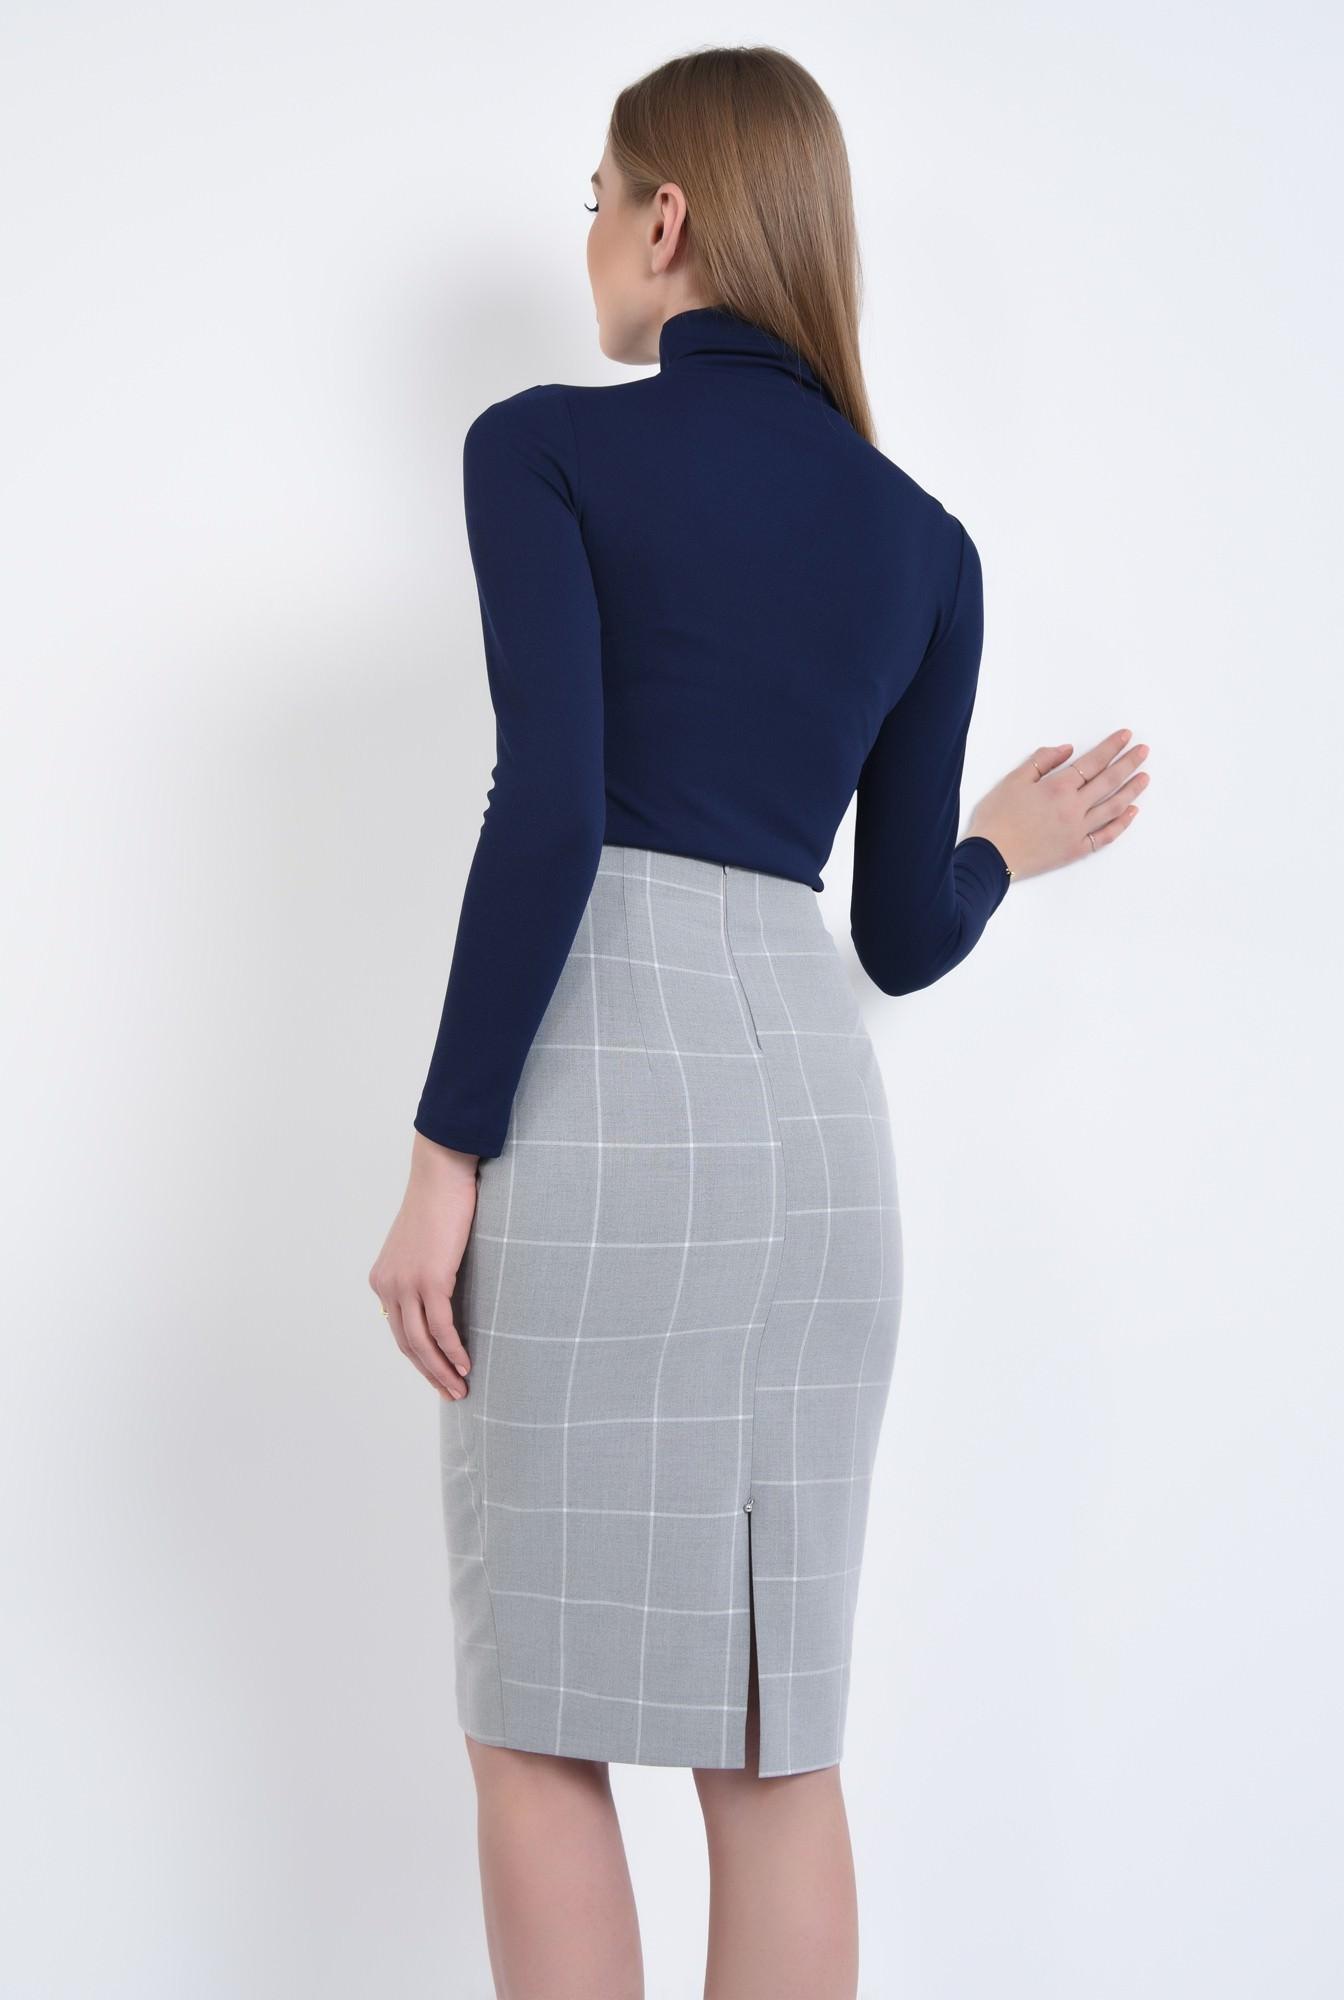 1 - 360 - Bluza casual stretch, elastan, helanca